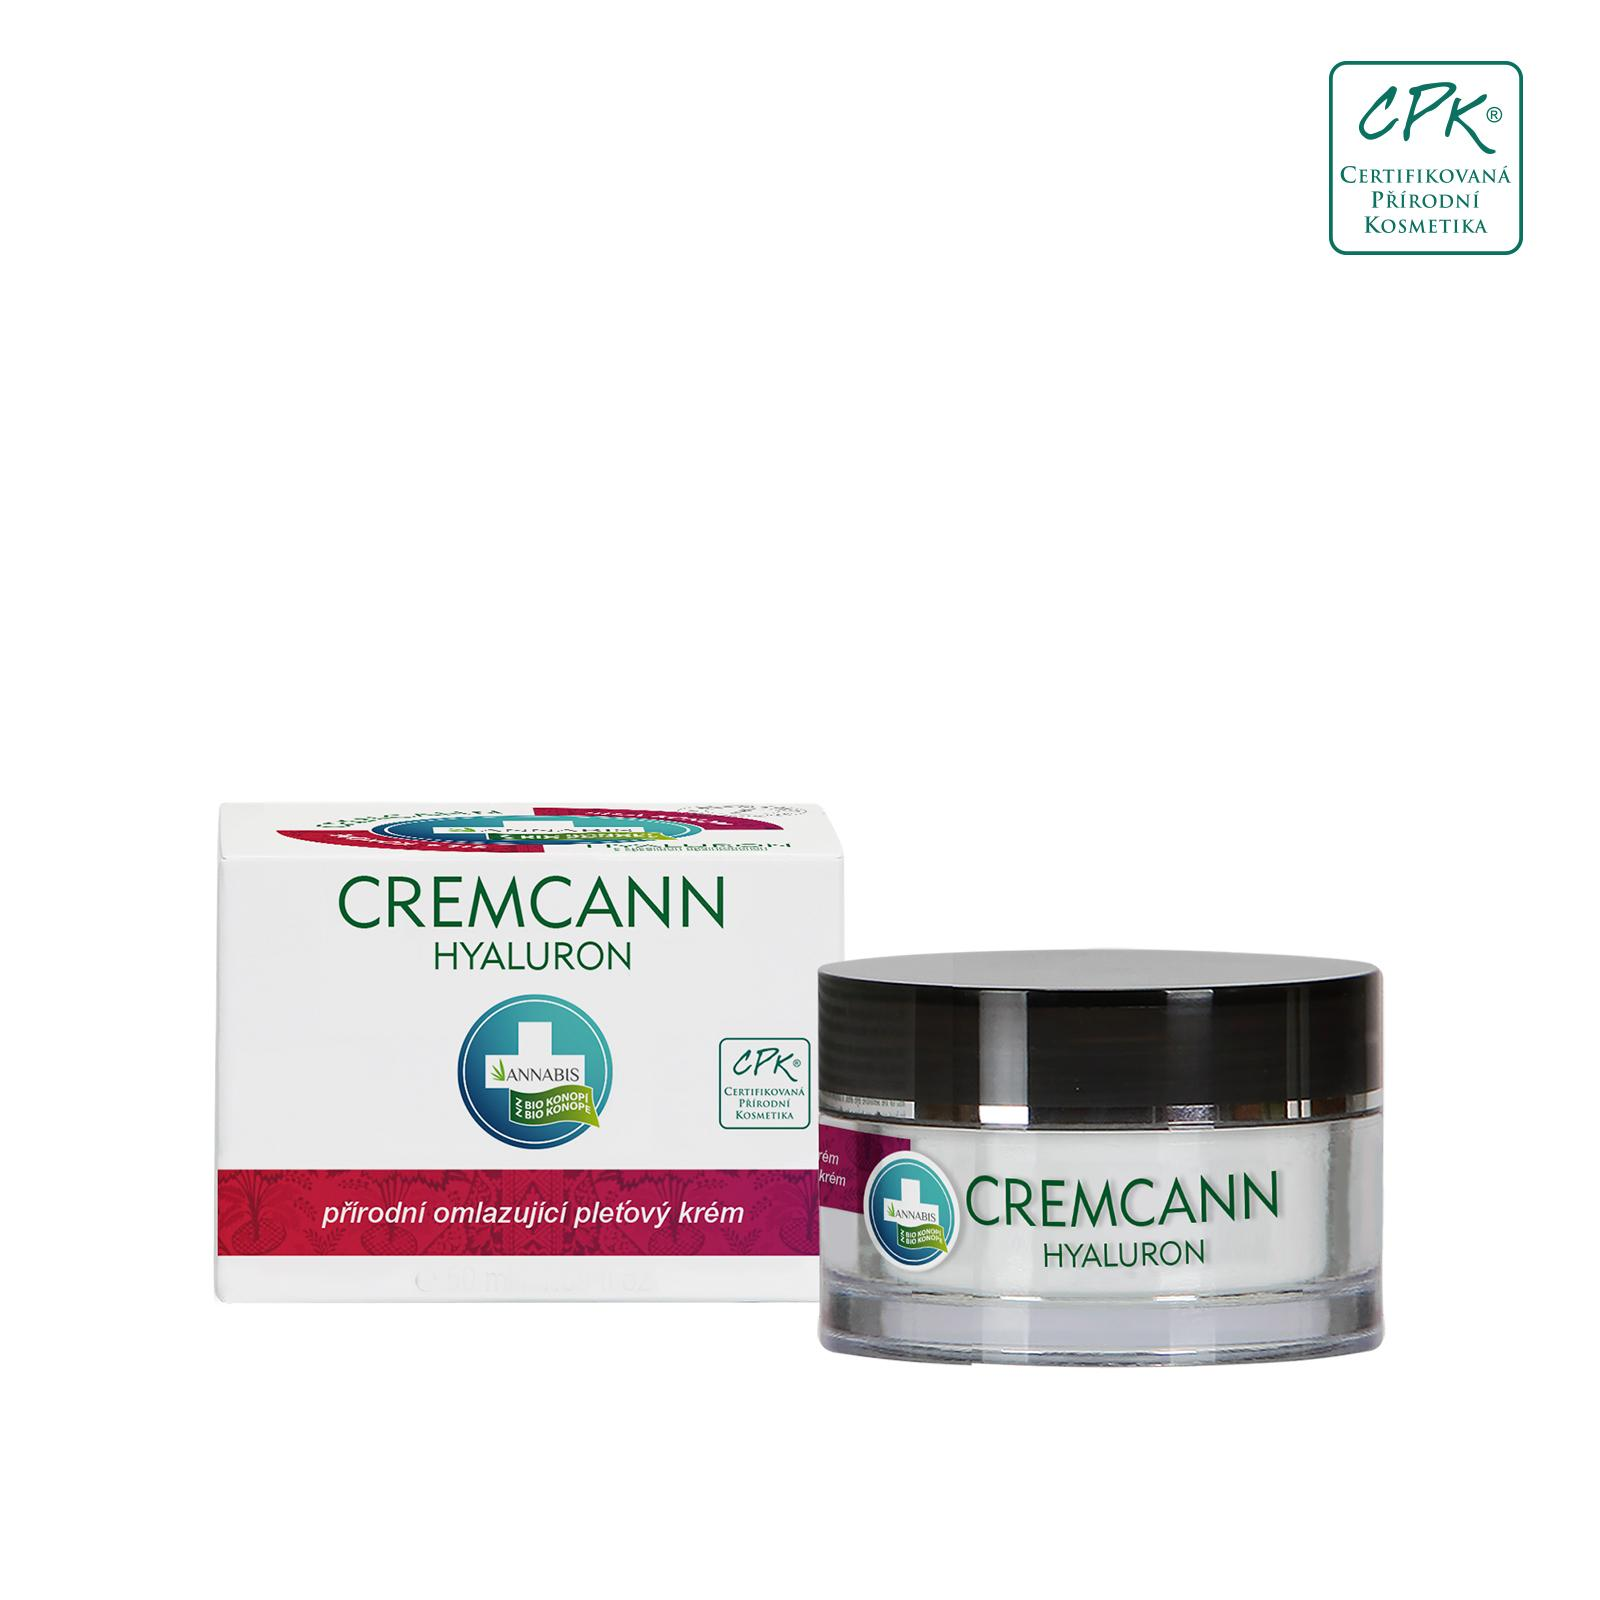 Annabis Hyaluronový krém, Cremcann 15 ml